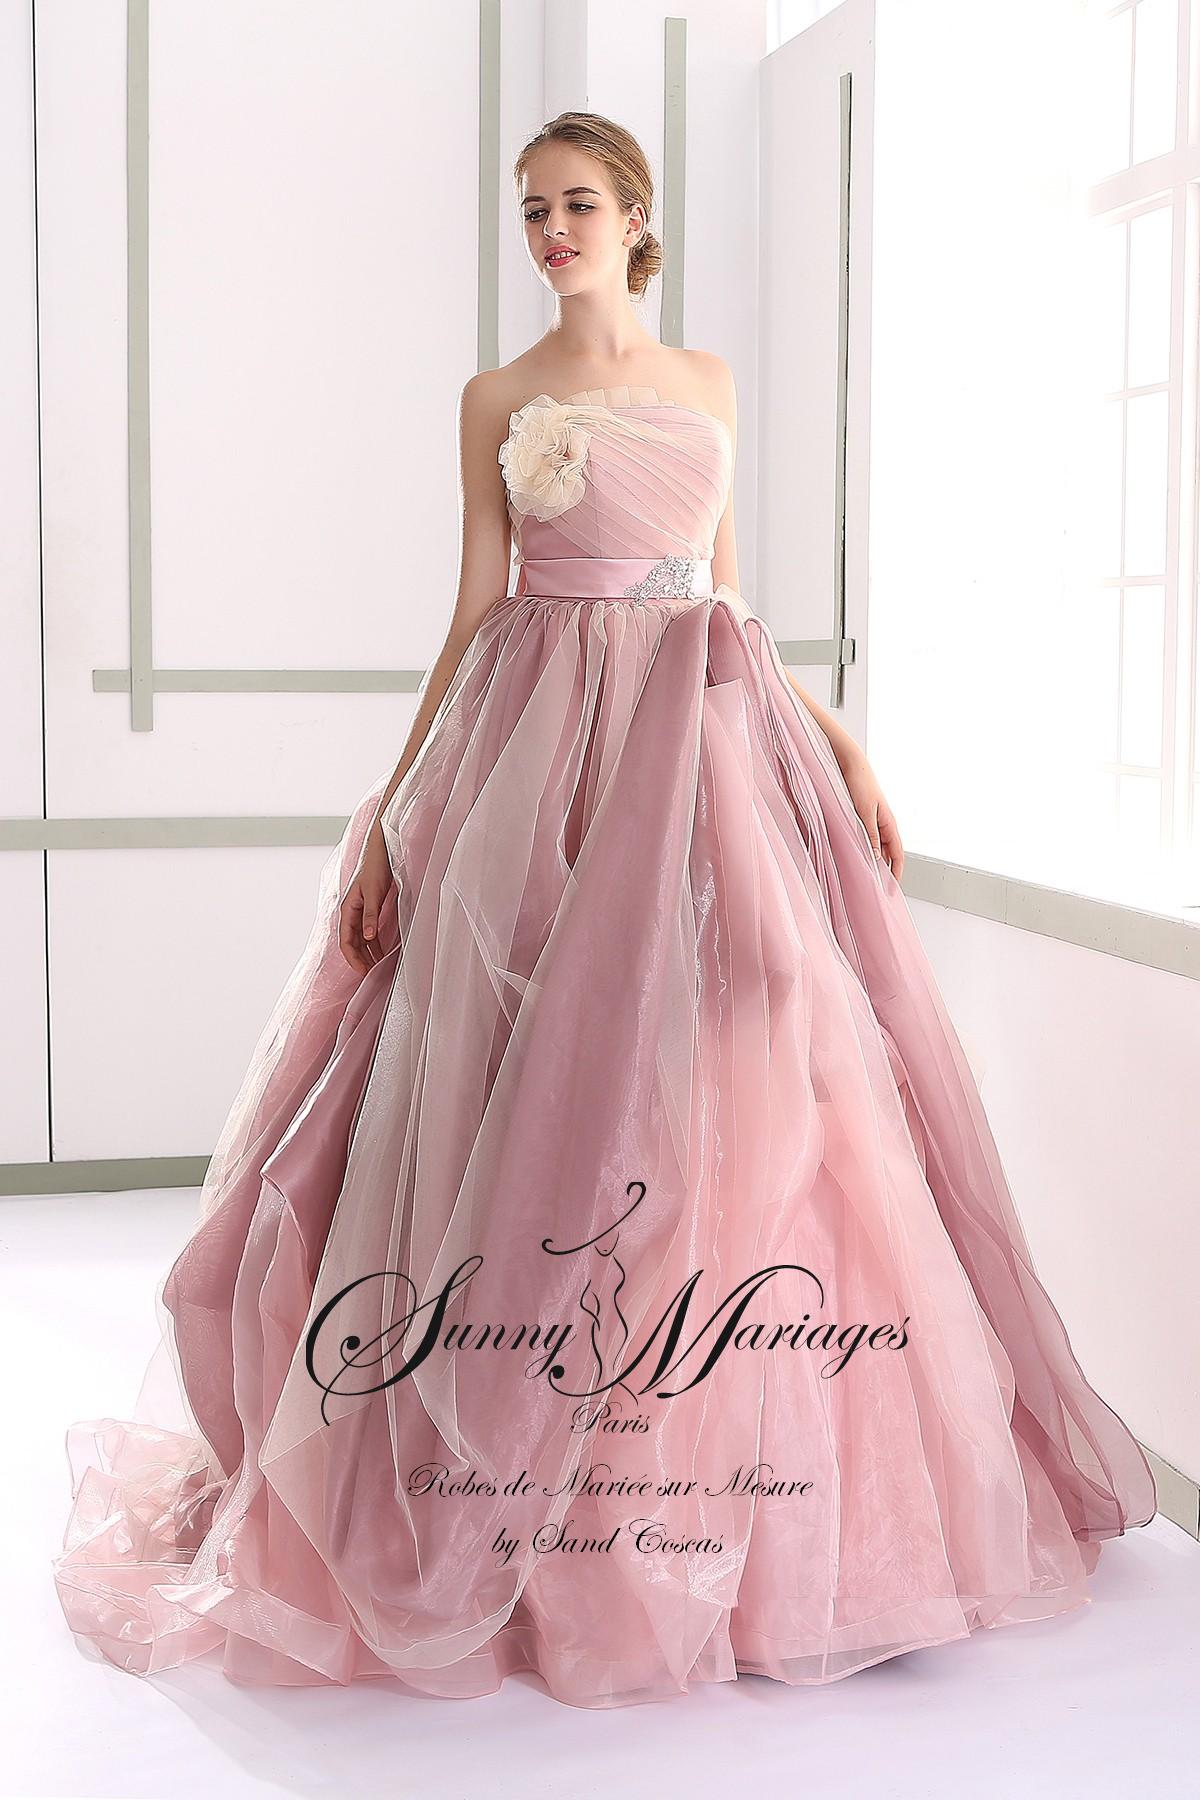 Robe De Mari 233 E Princesse Couleur Rose Poudr 233 Sunny Mariage